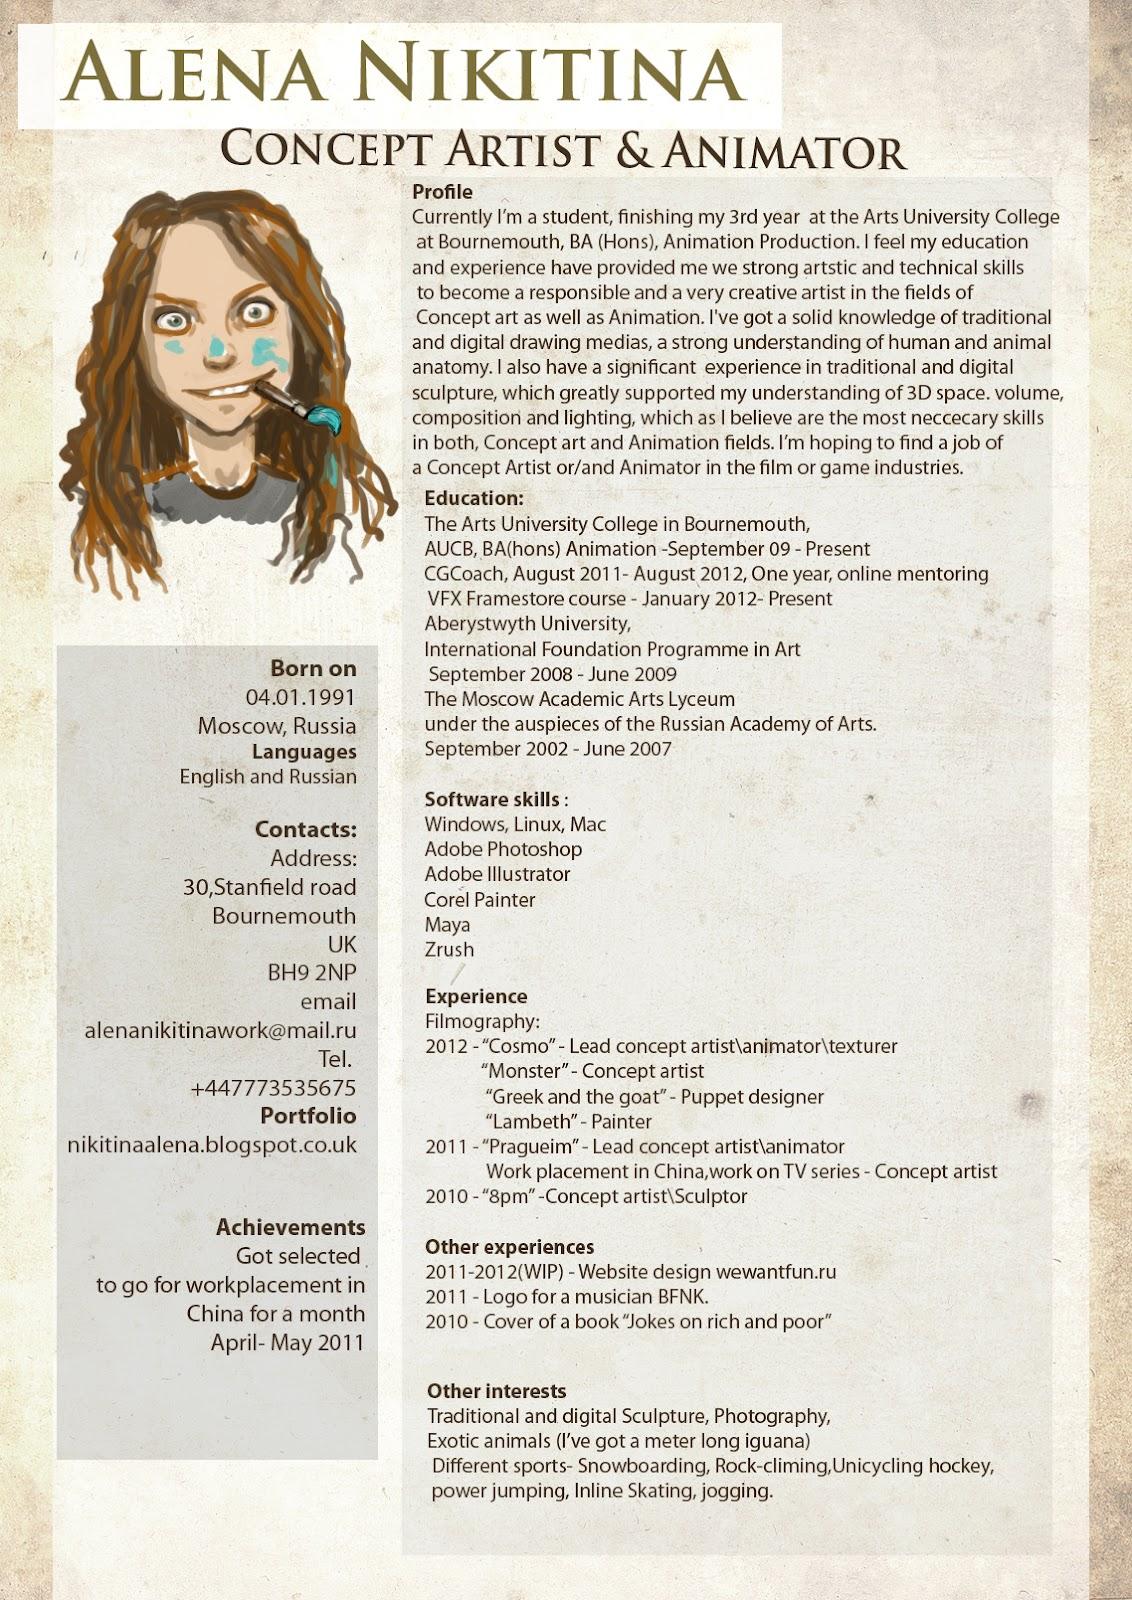 Alena Nikitina: CV & Contacts